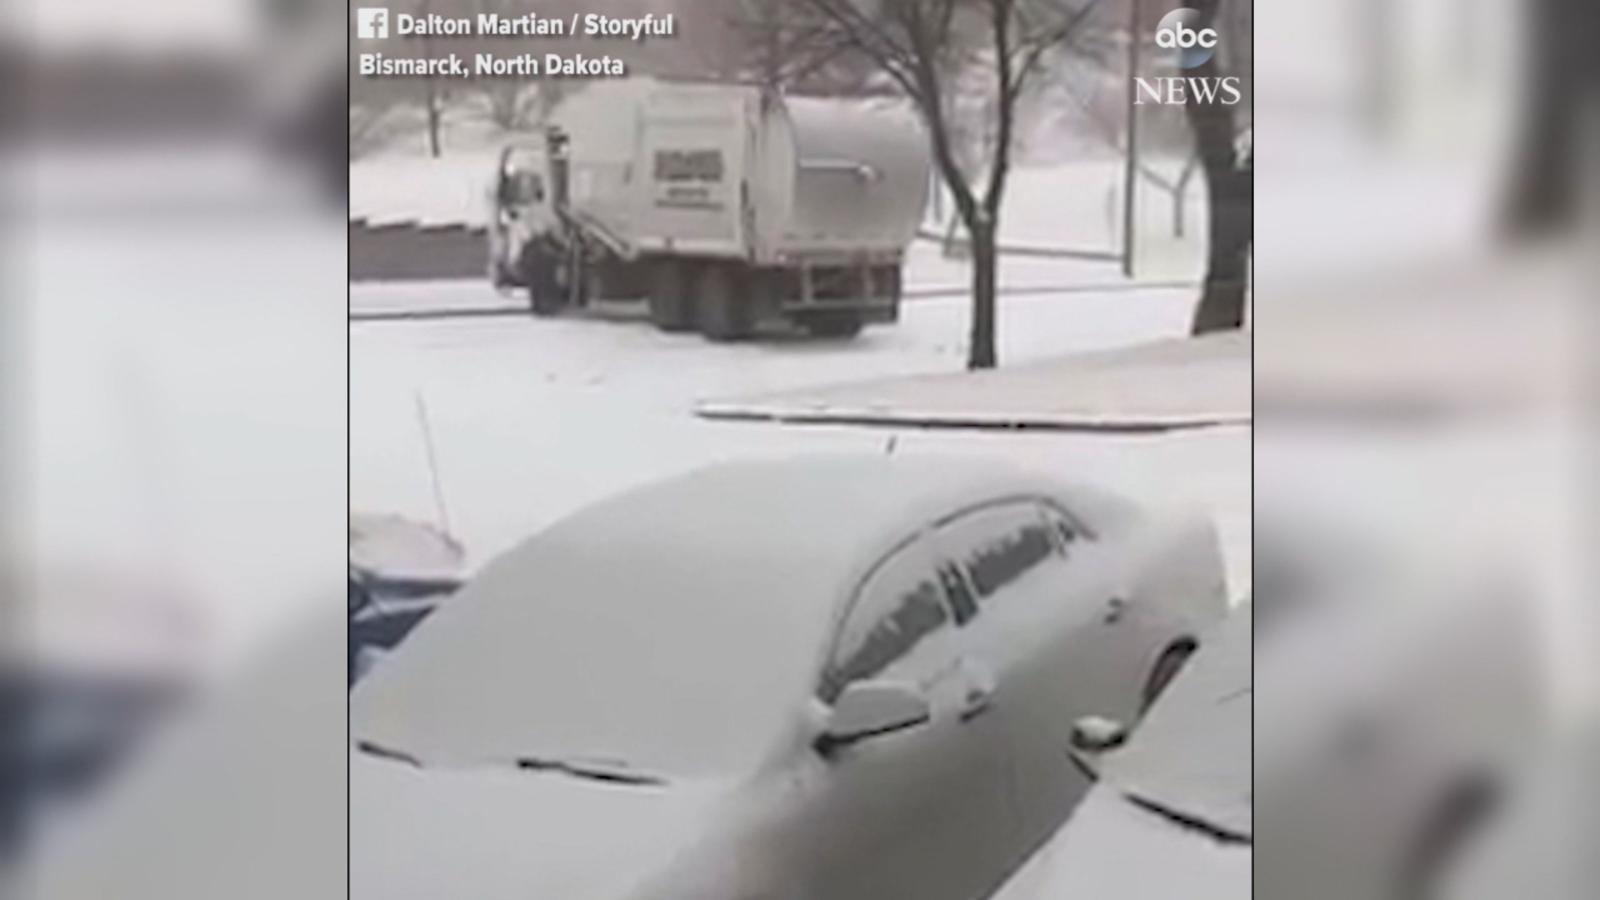 VIDEO: The truck fell victim to icy roads in Bismarck, North Dakota.